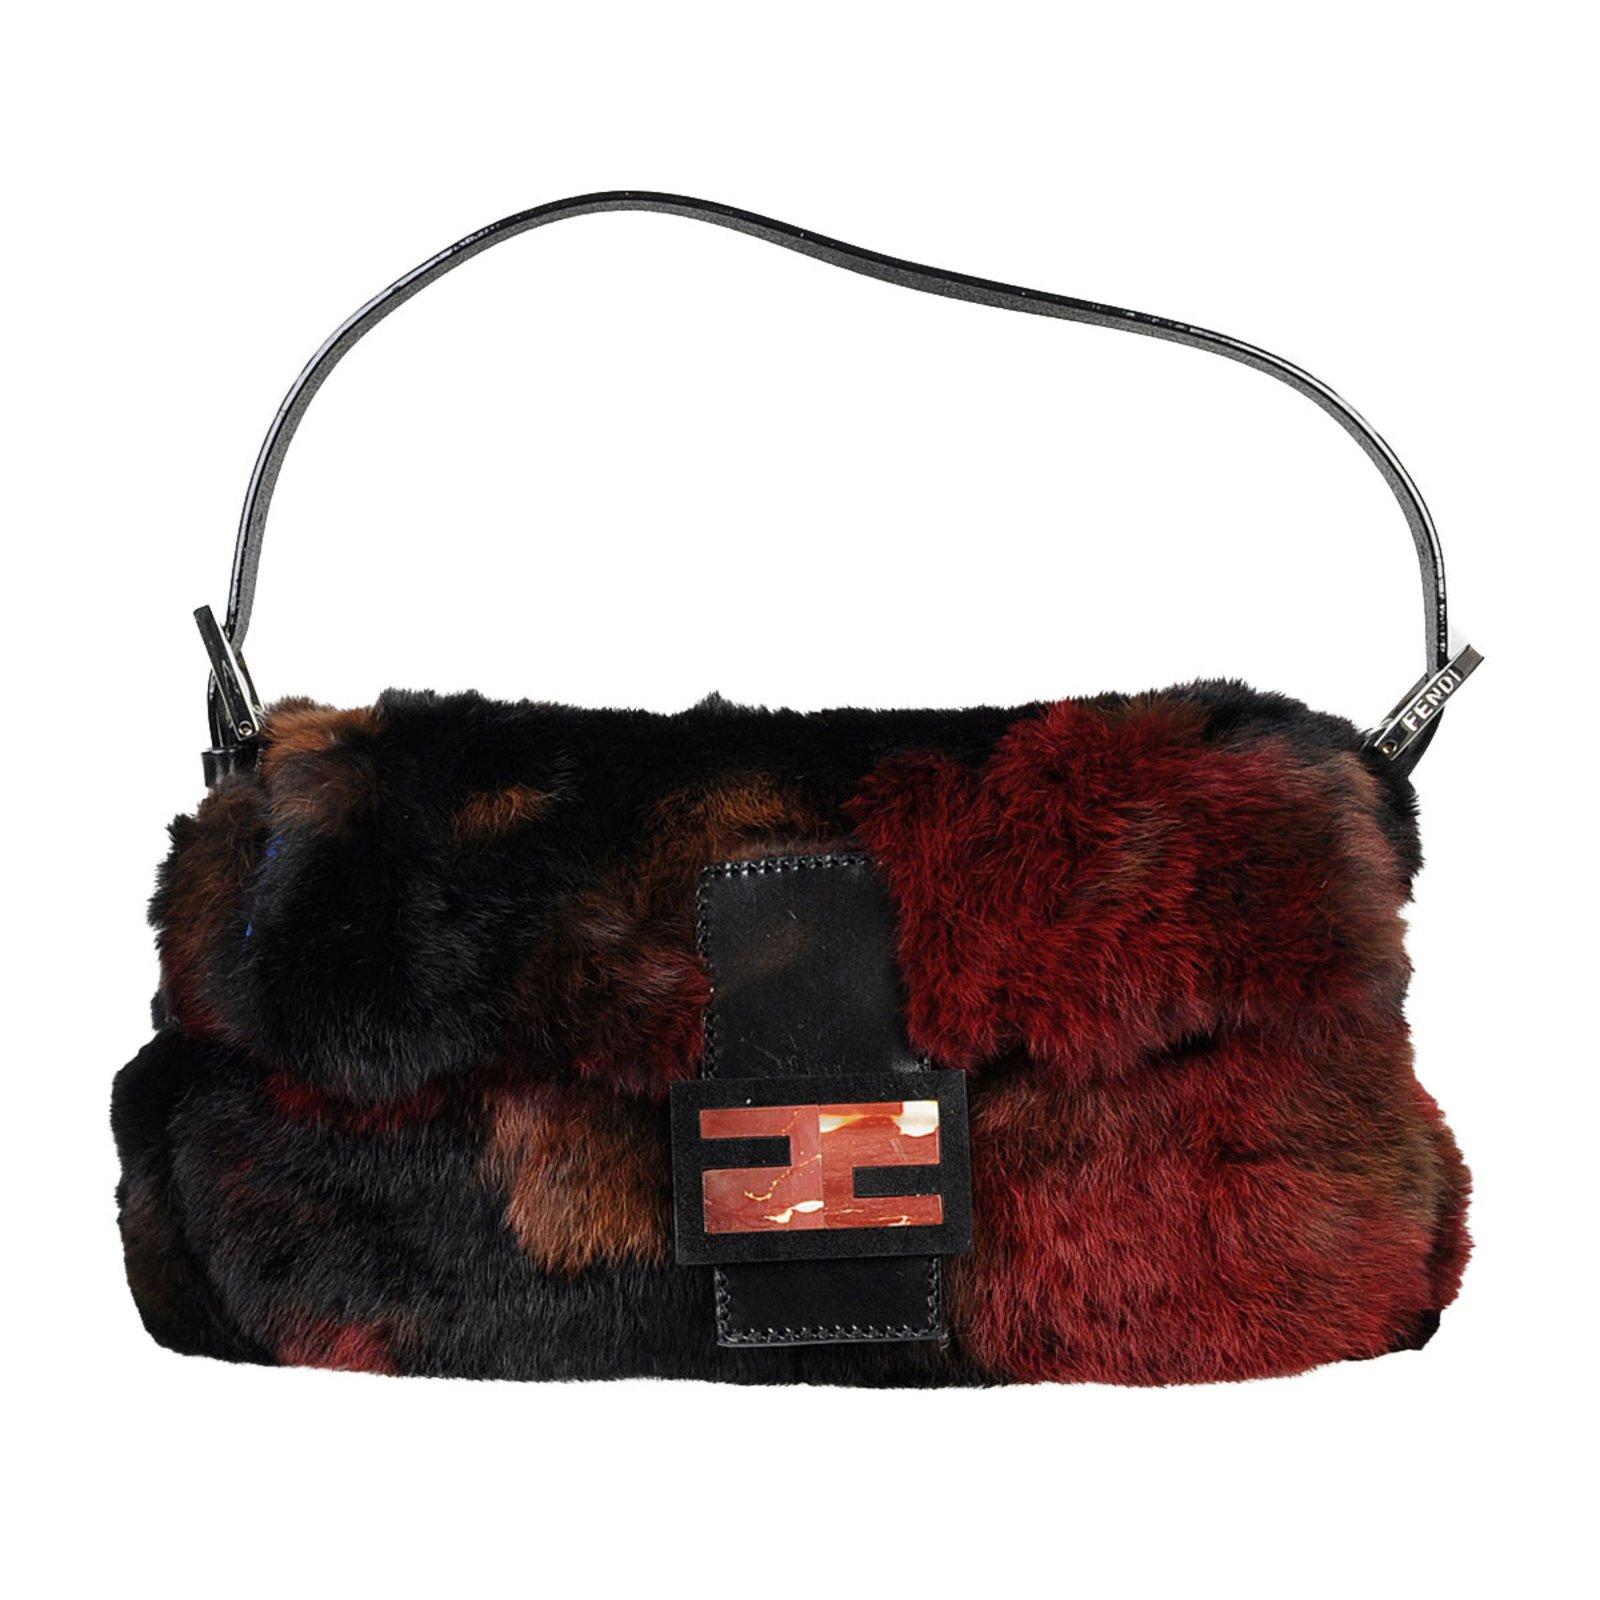 1c729dcf51 Baguette Bag